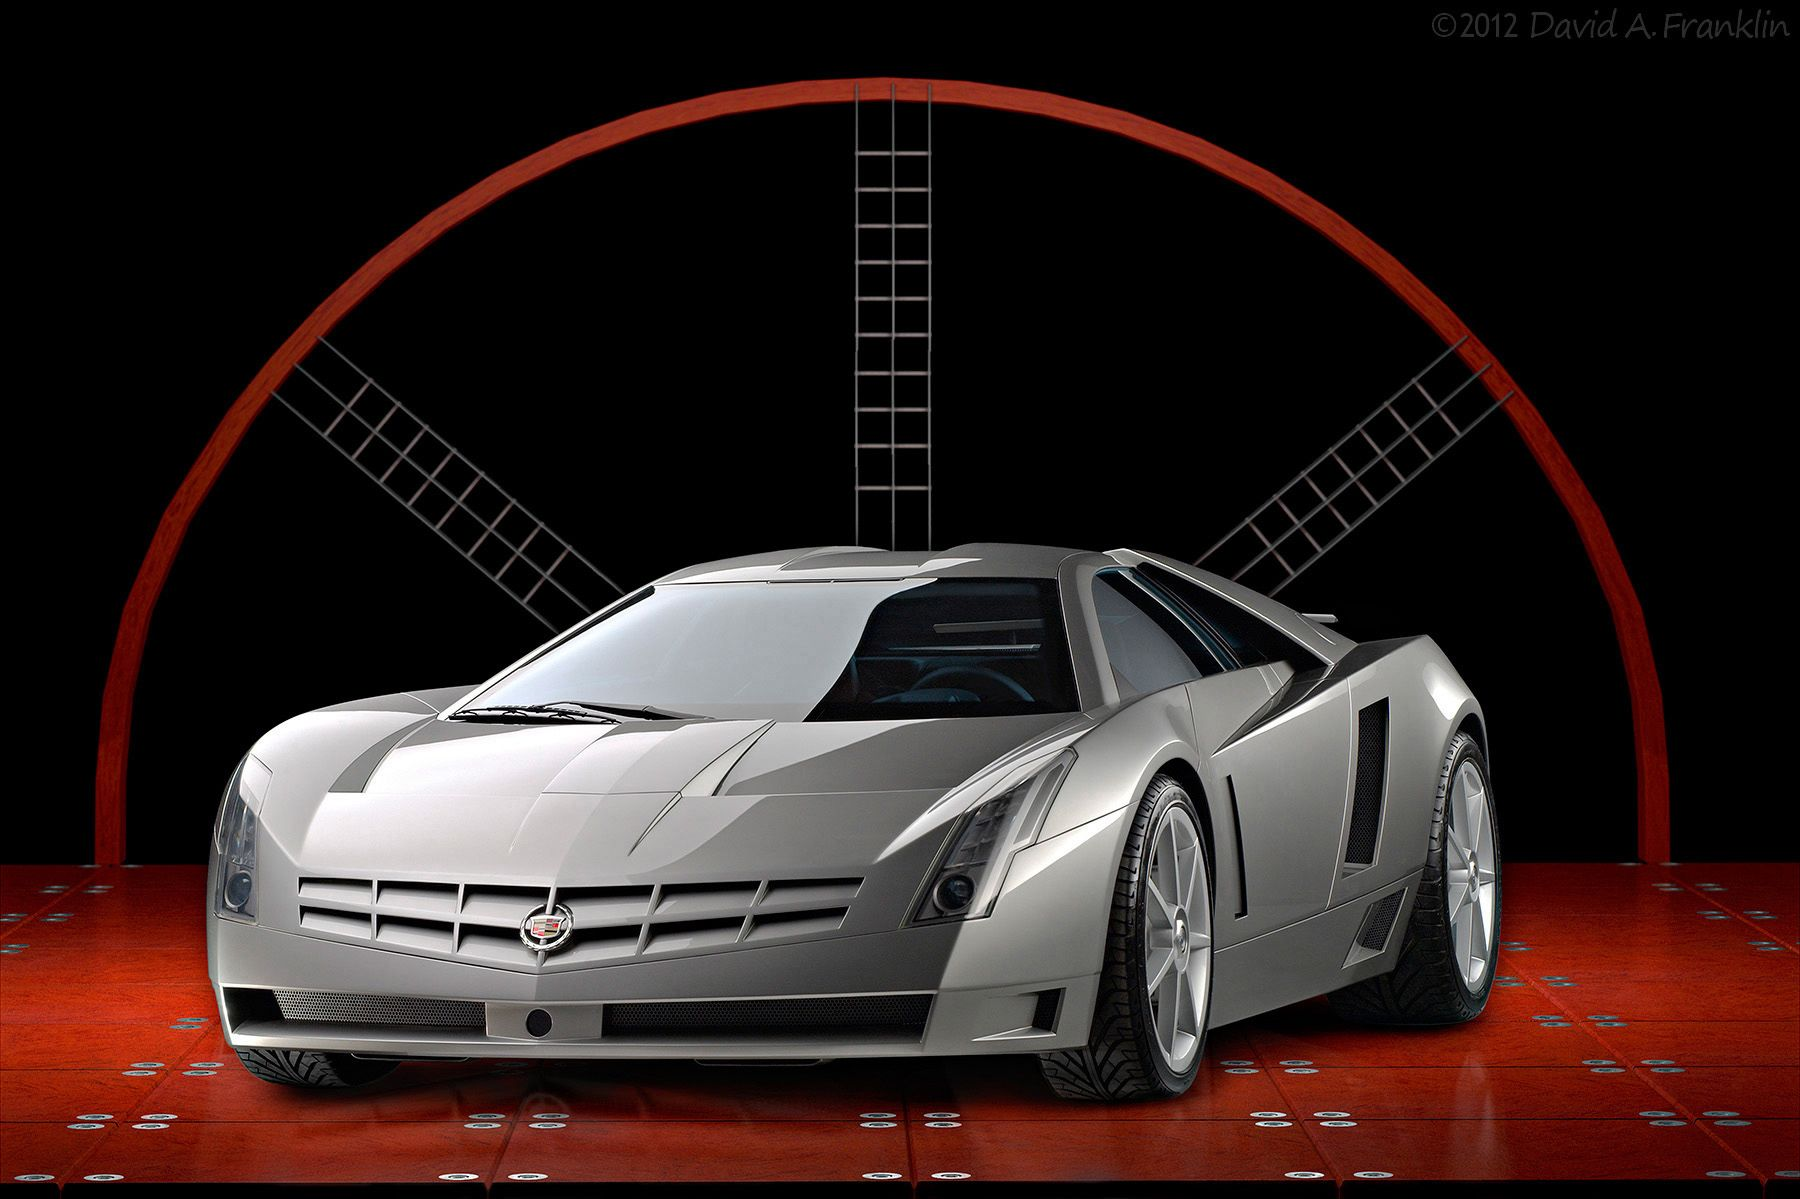 CadillacCienConcept_F78_3Dset_Studio